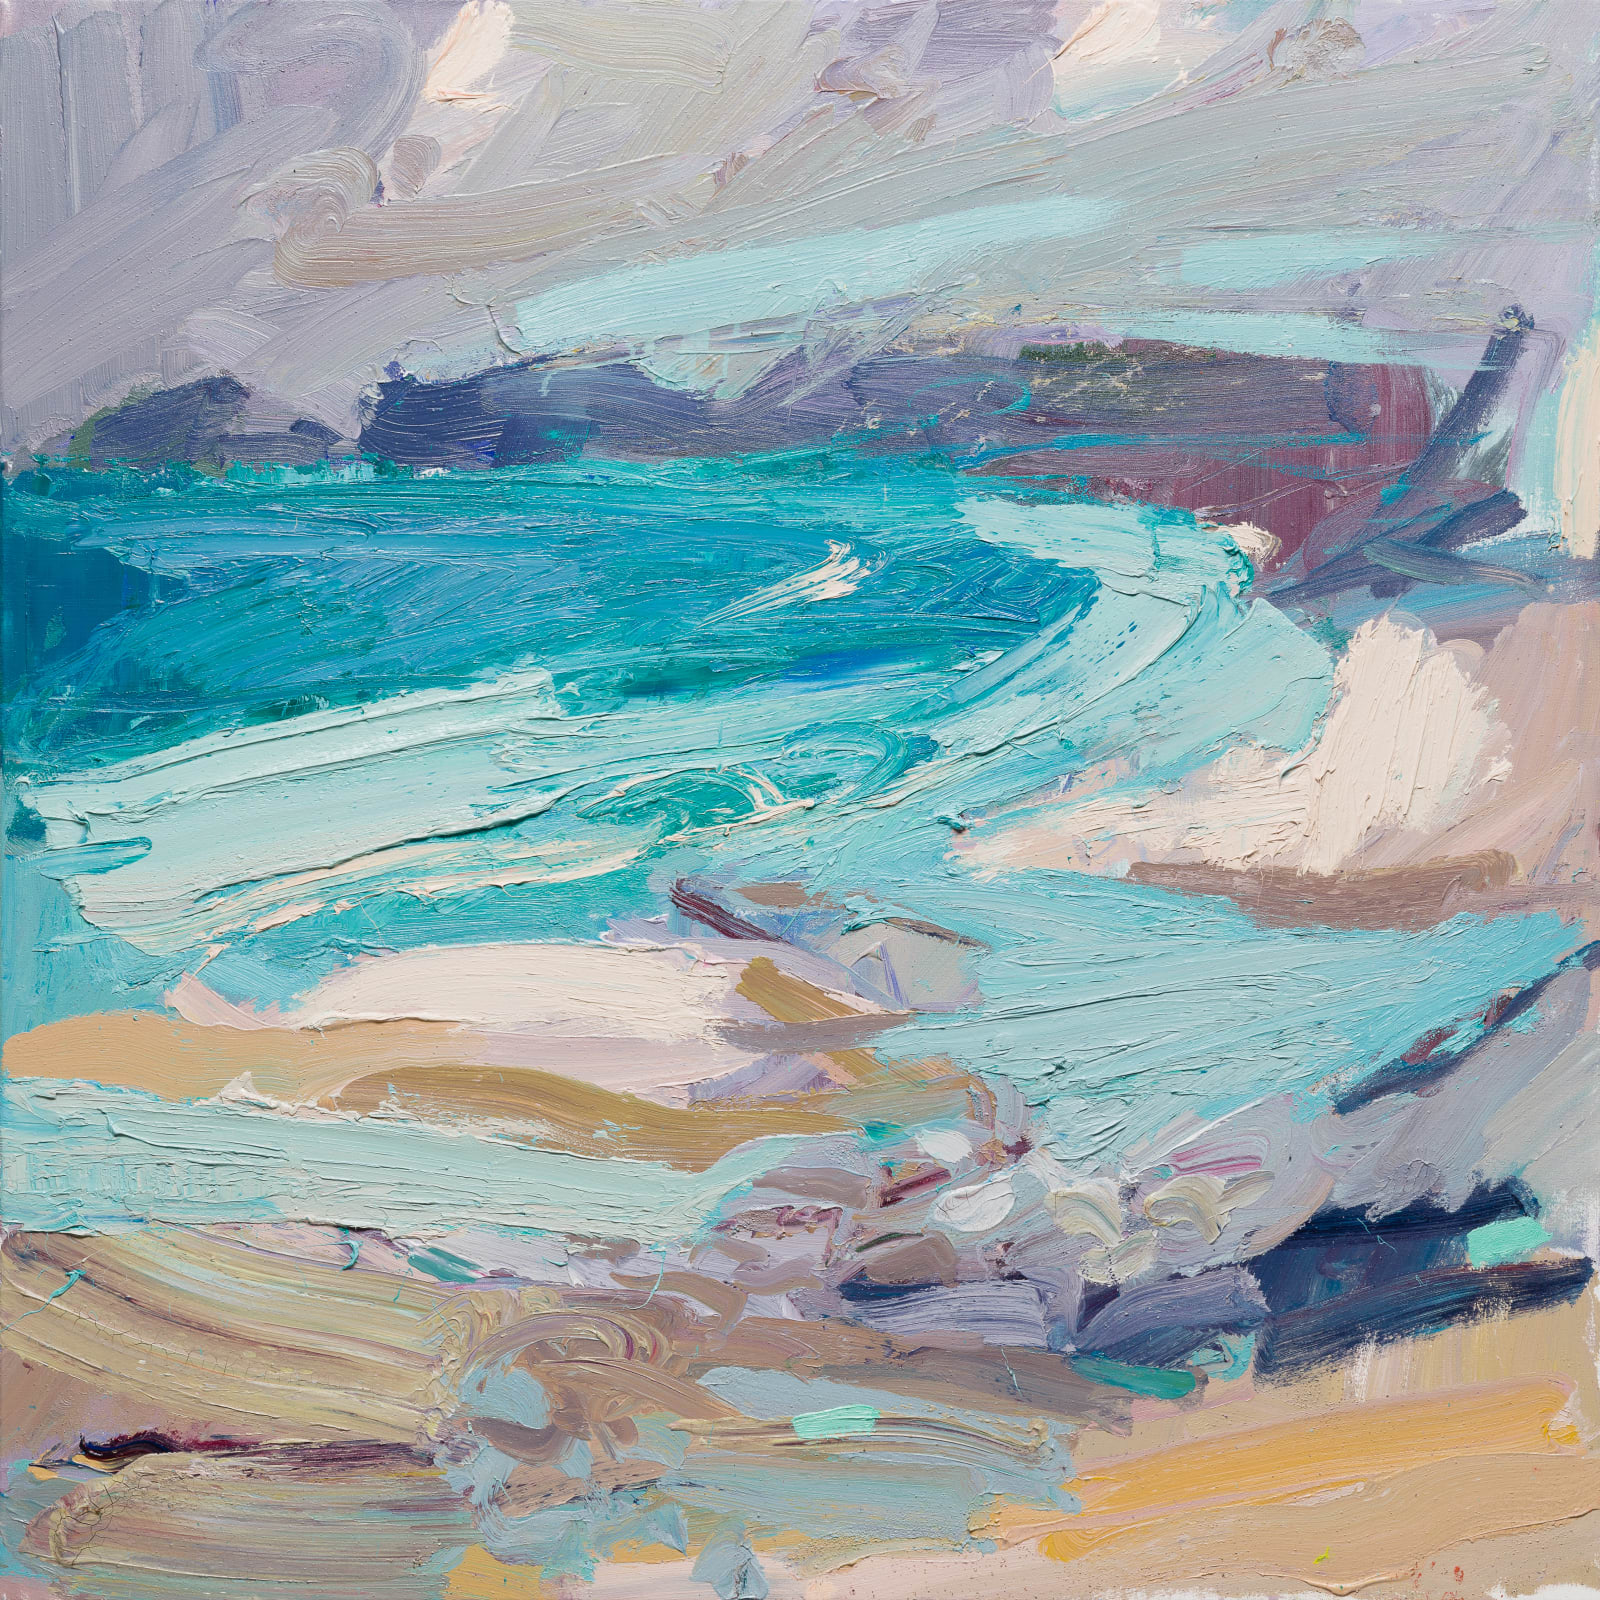 Paul Wadsworth, Sennen Cove Yellow Sands